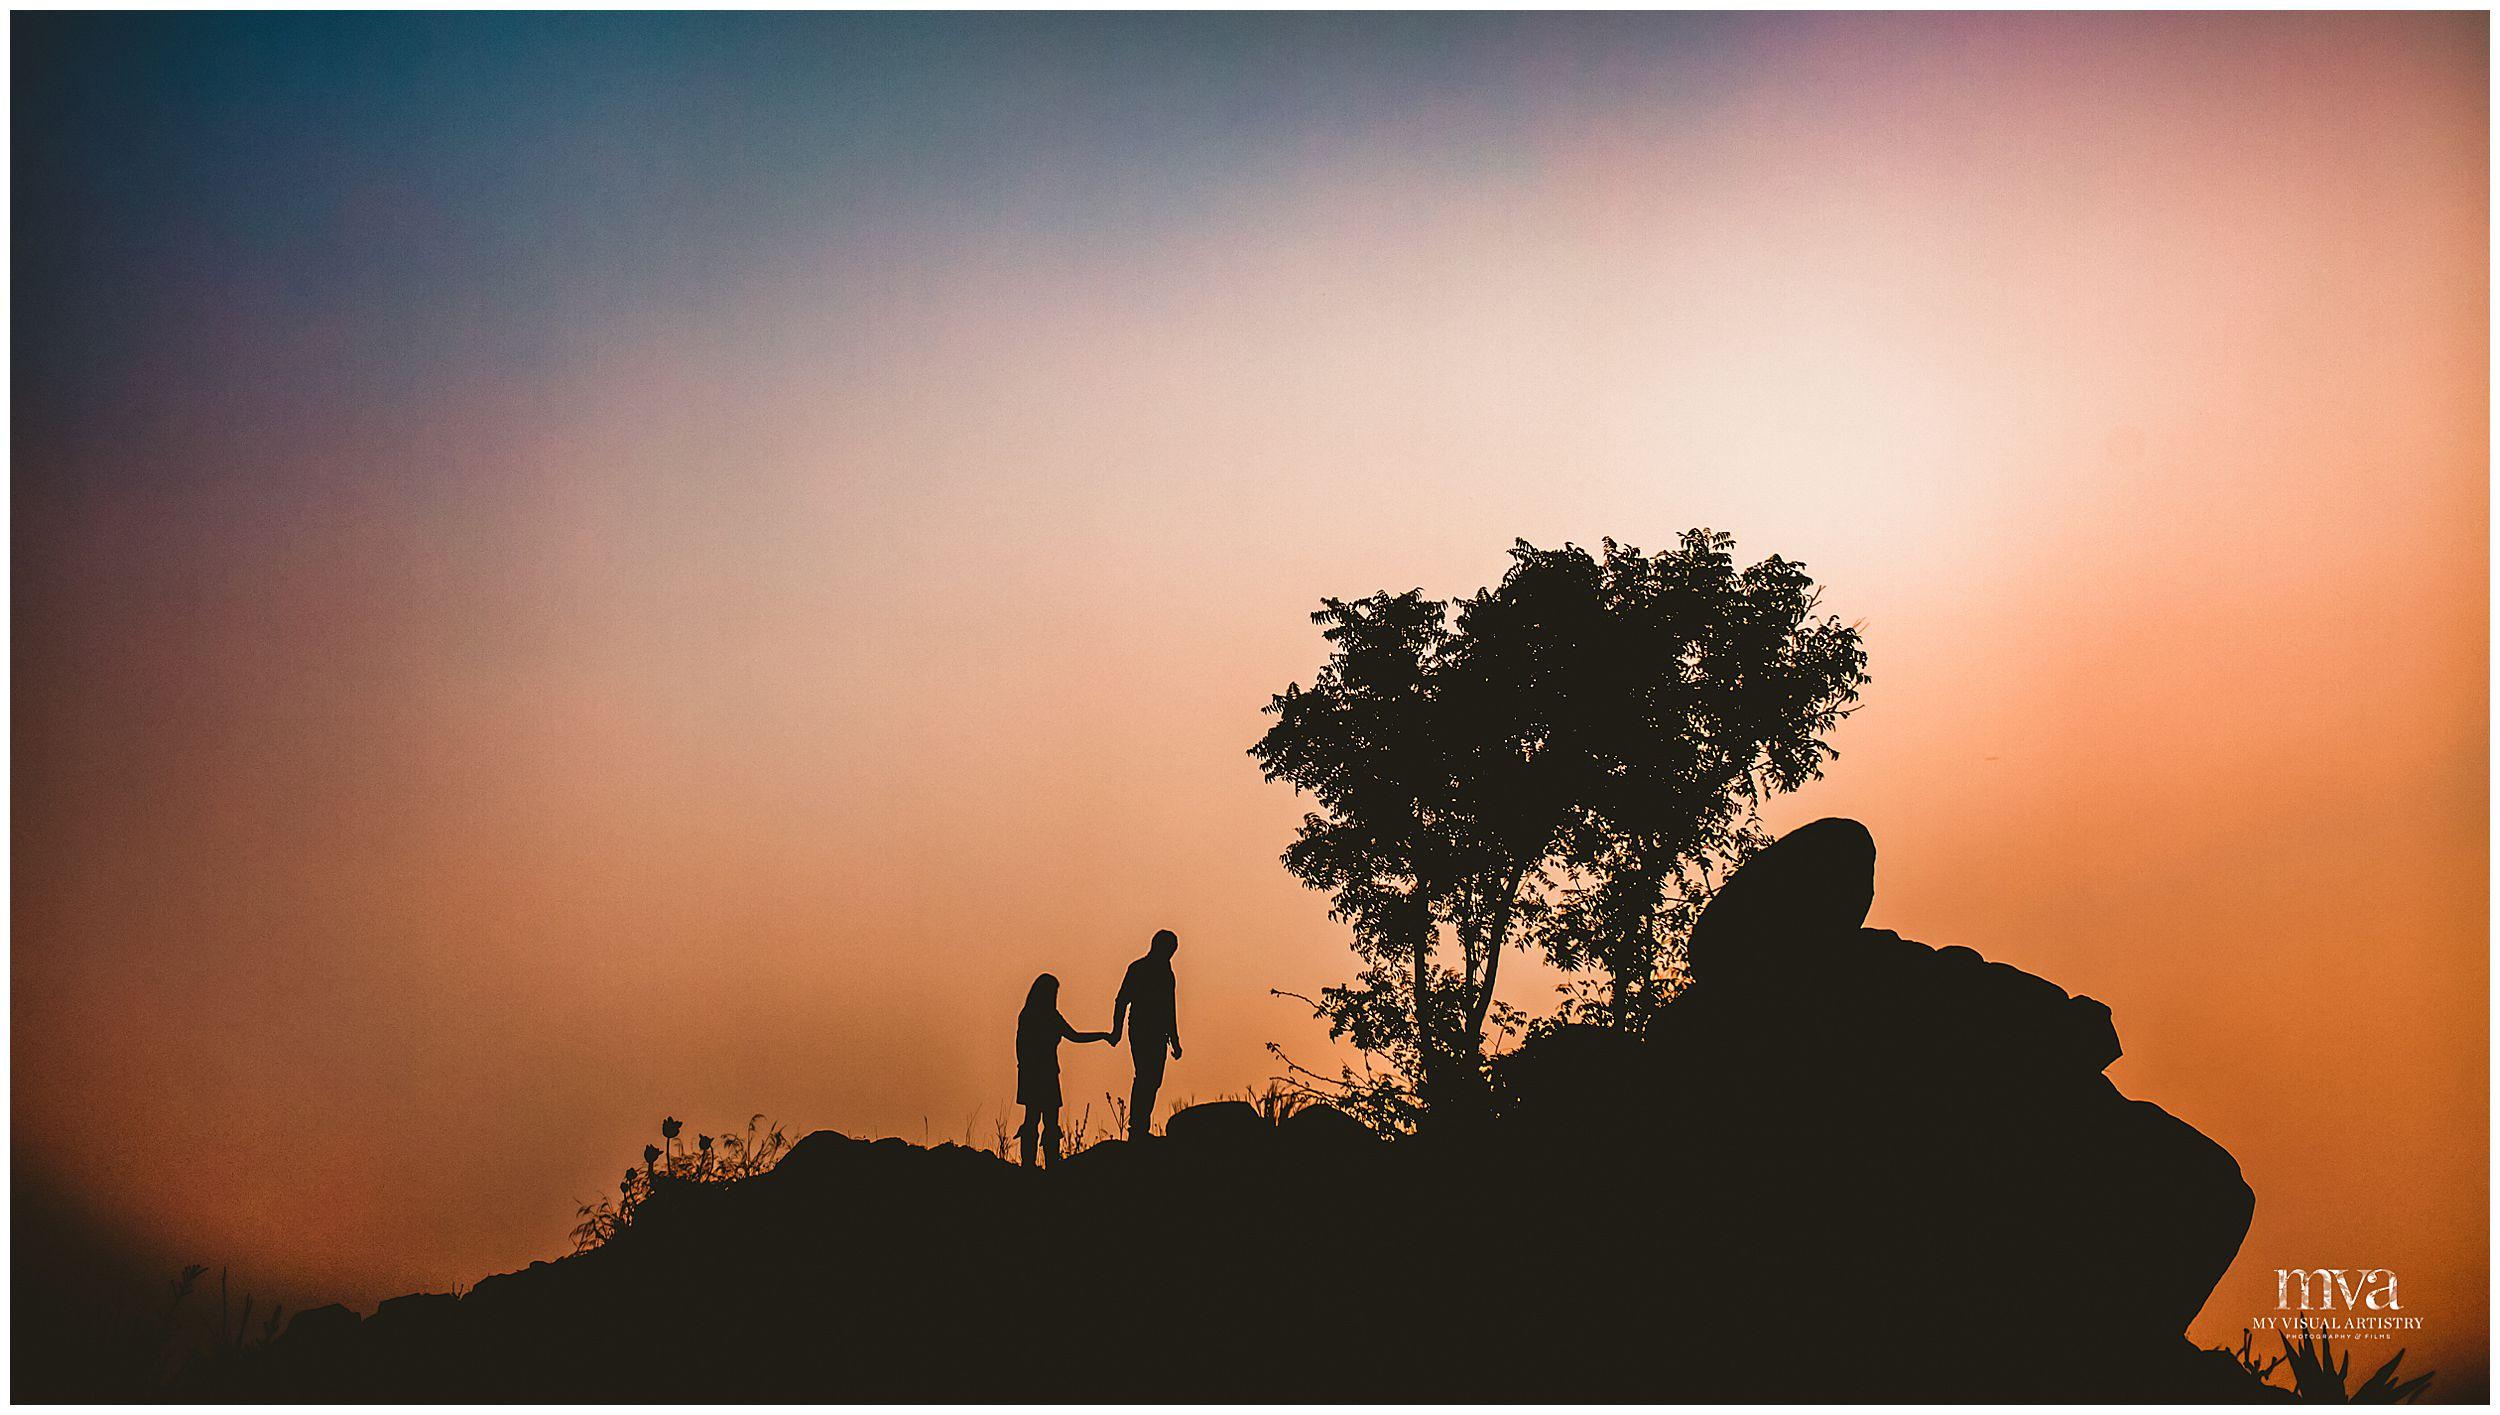 SAHIL_MANALI_MYVISUALARTISTRY__WEDDING_PHOTOGRAPHER_JANNATVALLEY_COUPLESHOOT_DESTINATION_FARIDABAD_PREWEDDING1.jpg